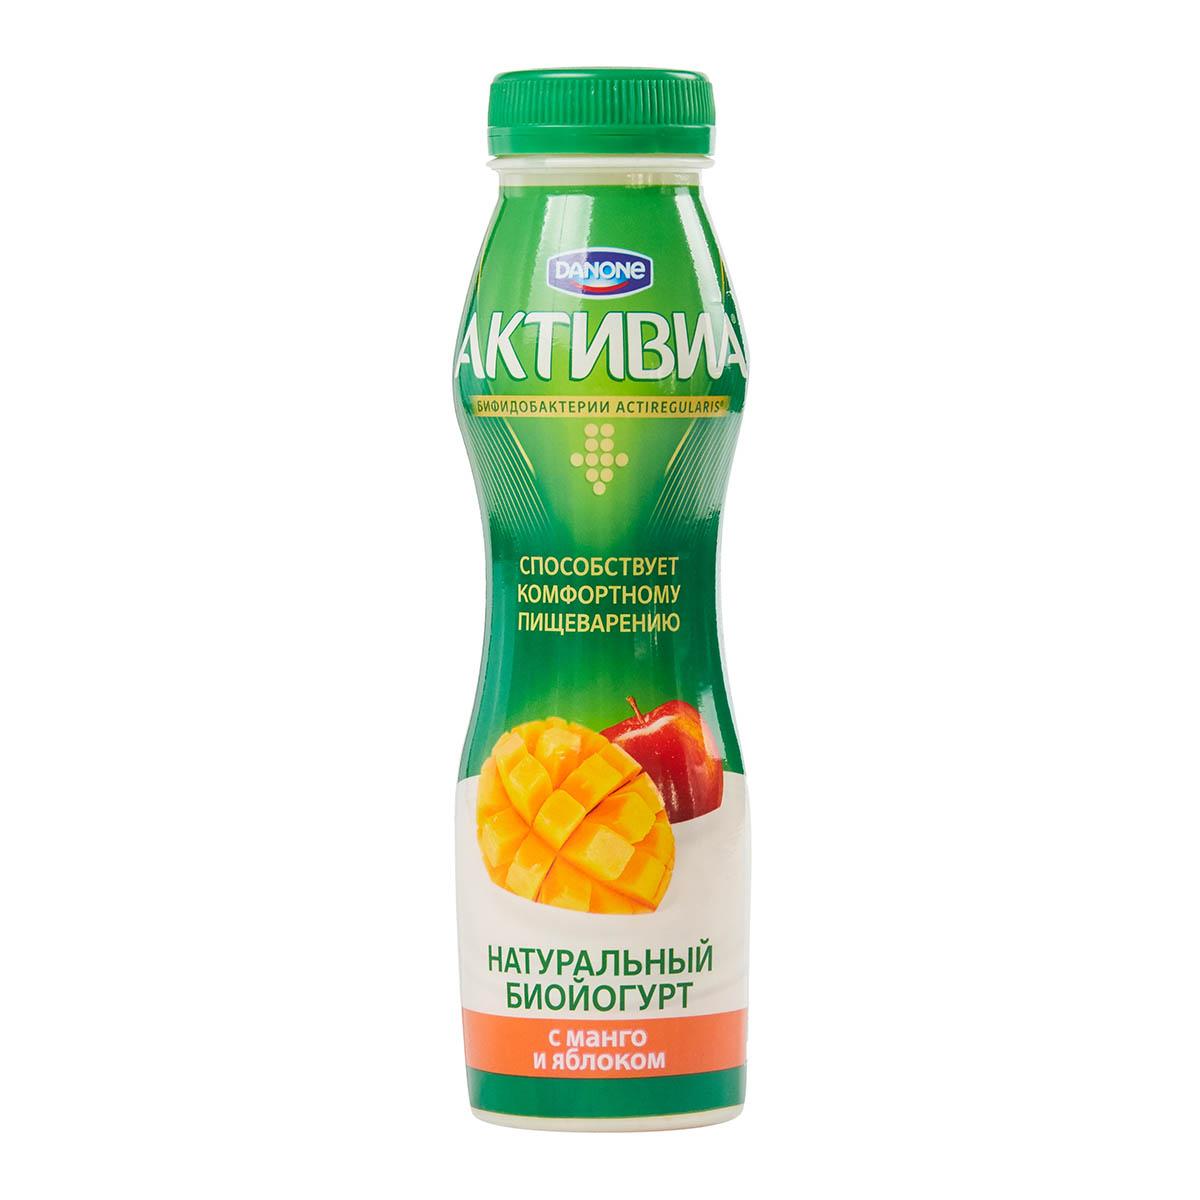 «Активиа» 2% манго-яблоко